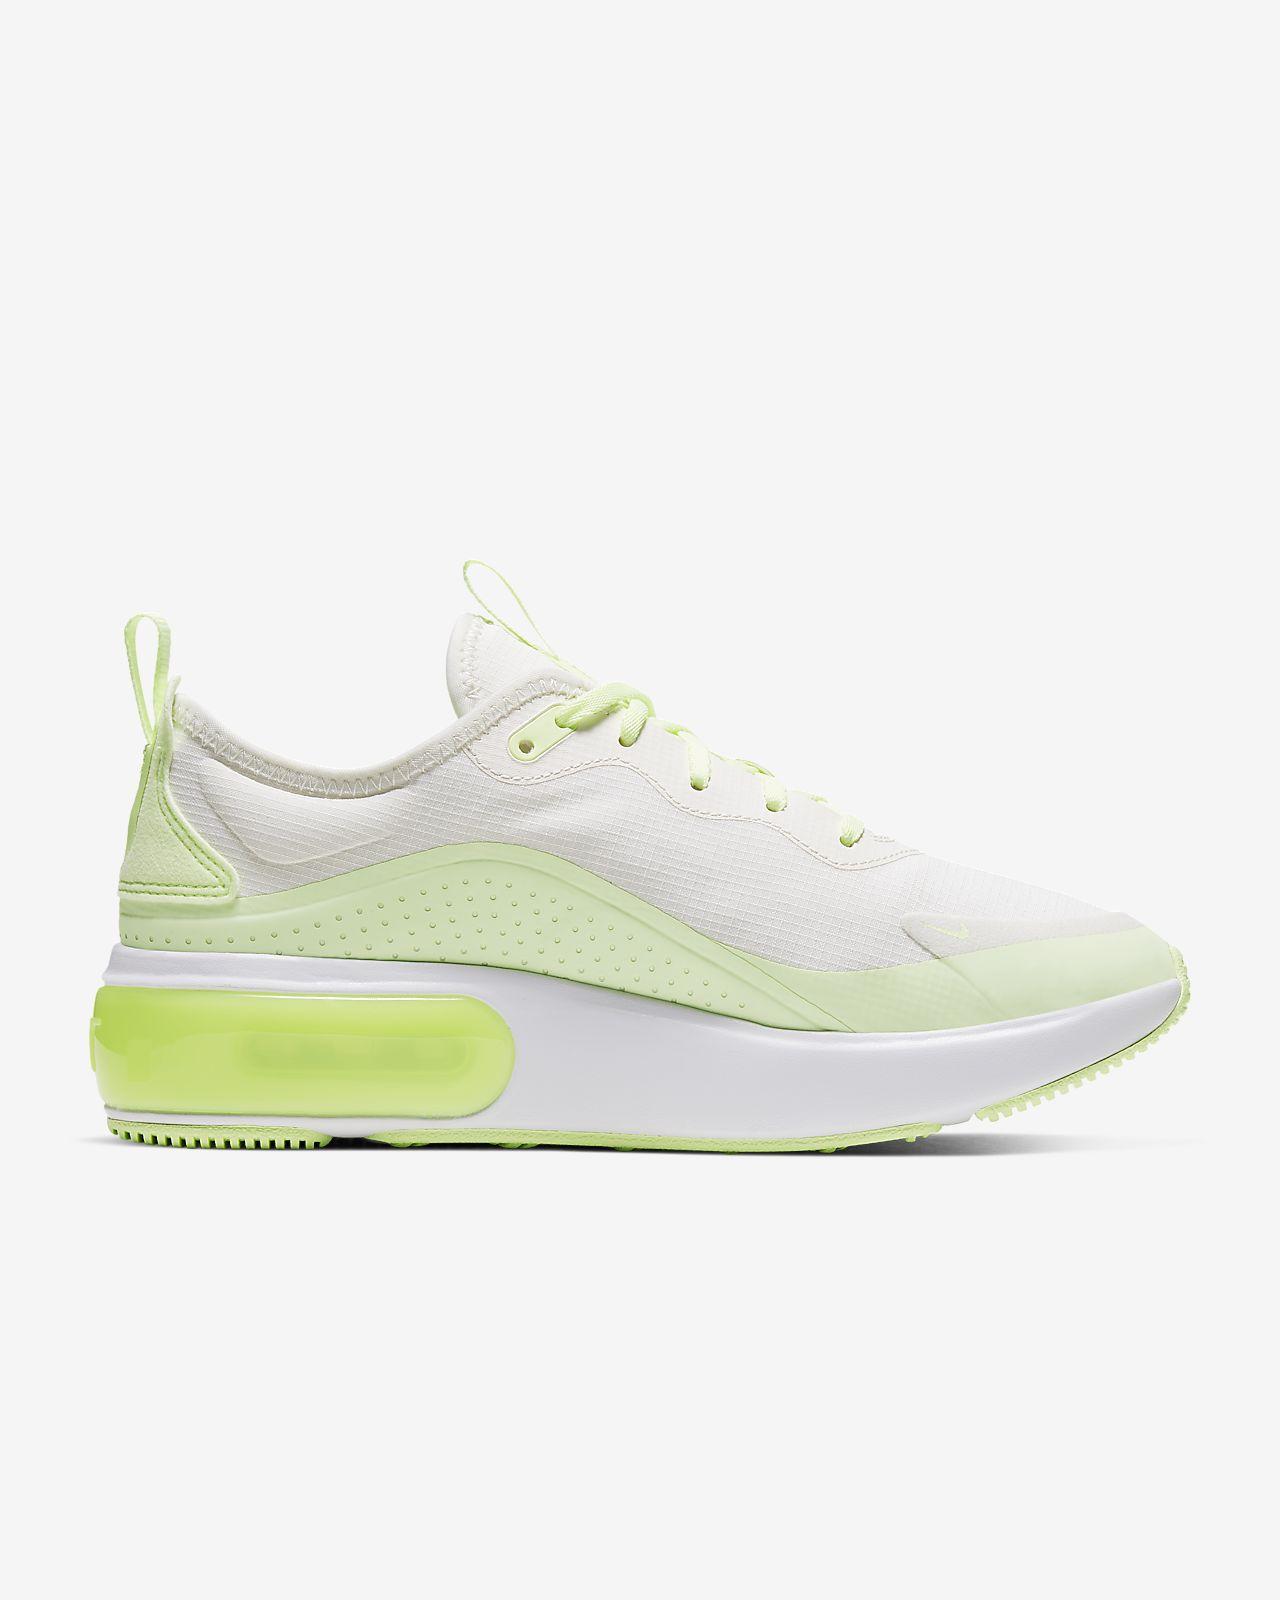 Nike Air Max Dia sko til kvinder